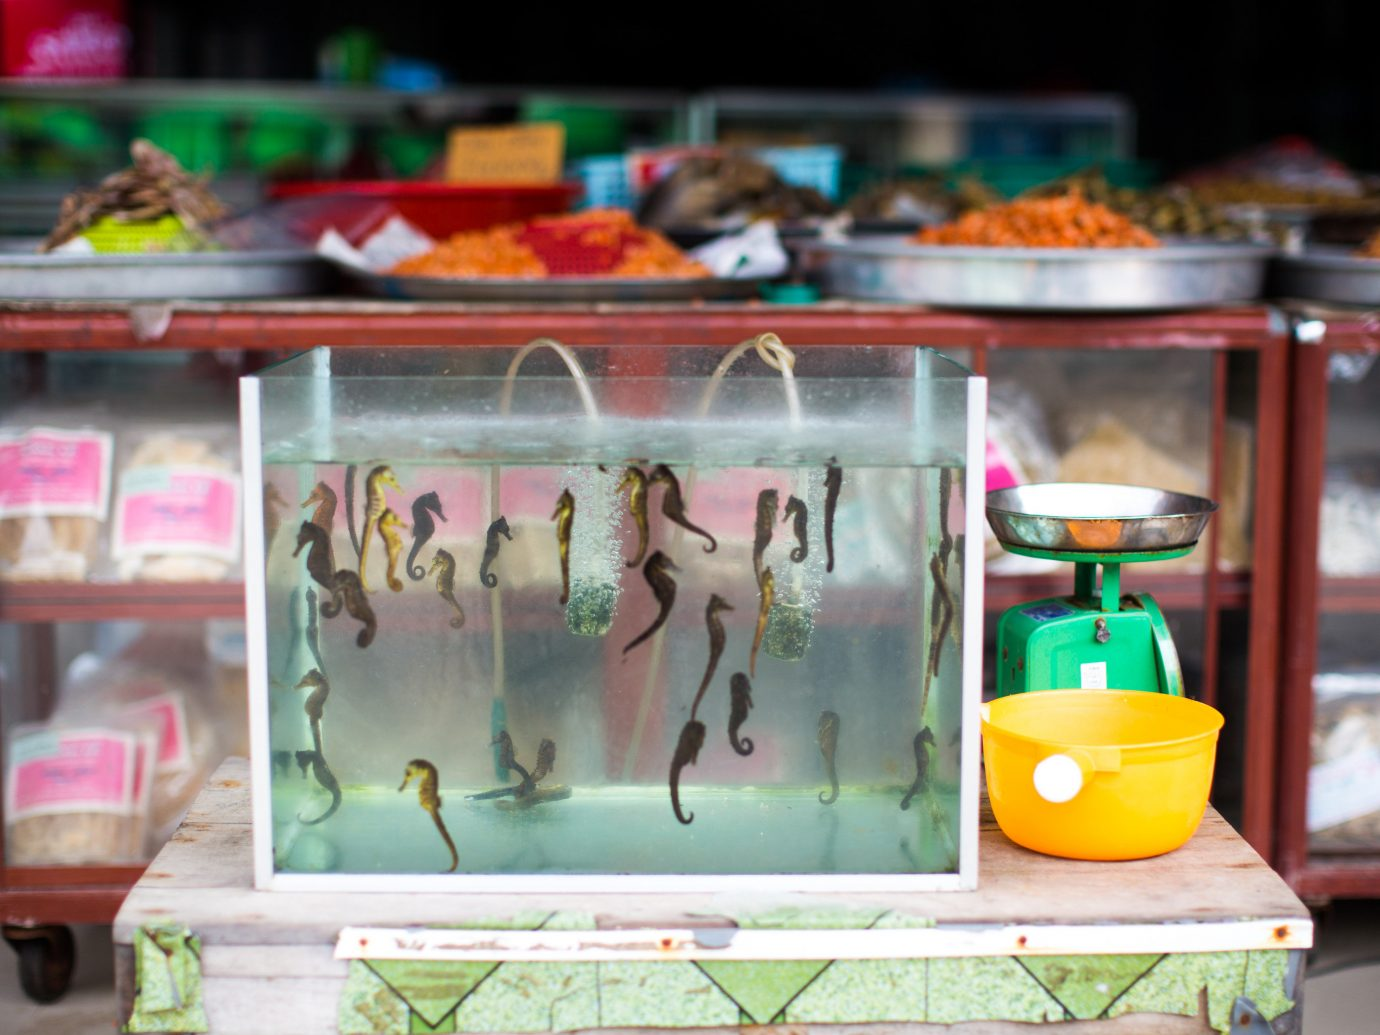 color display window floristry toy retail food